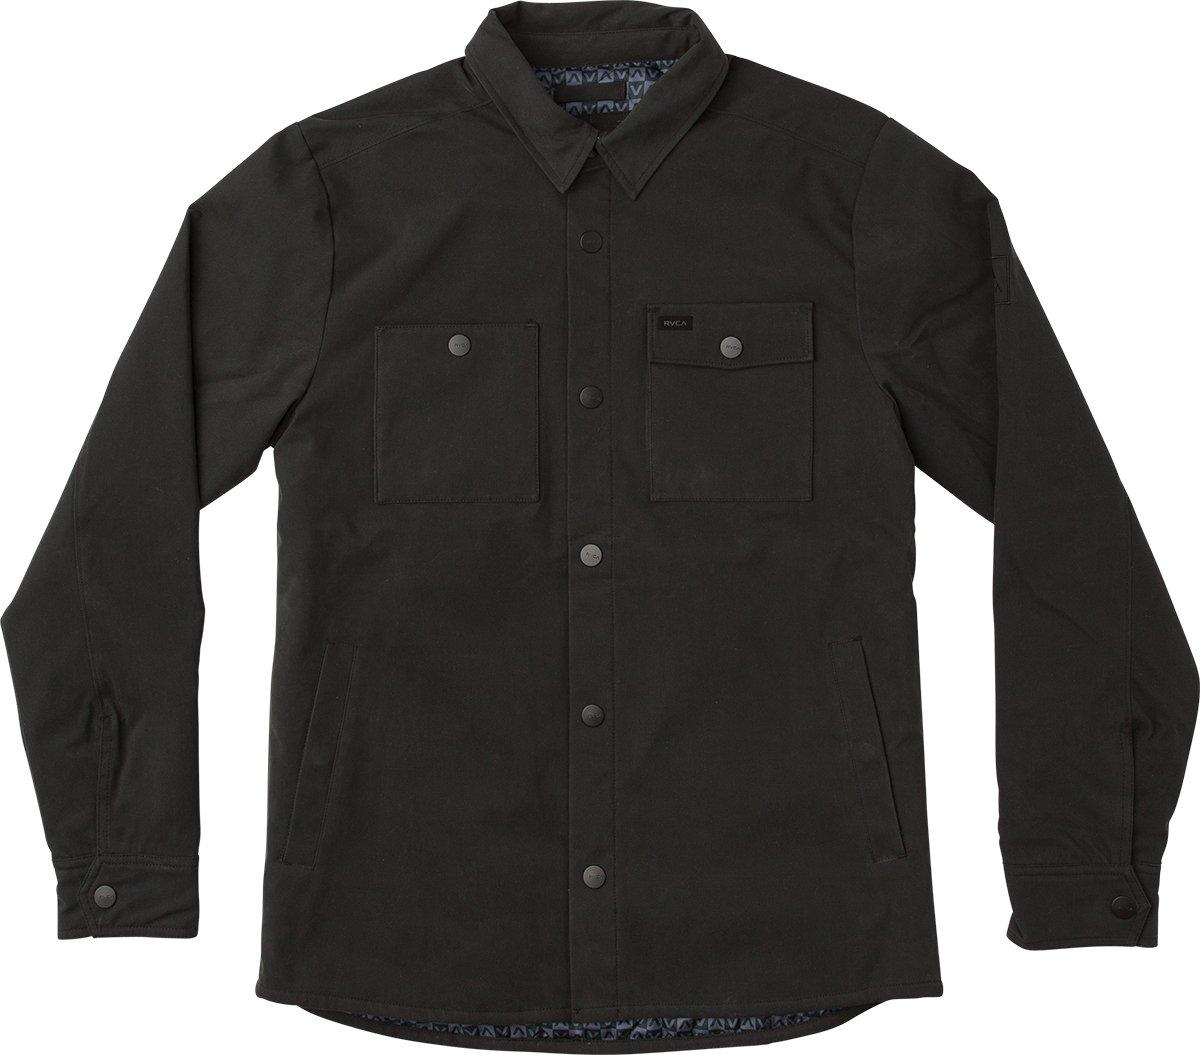 RVCA Men's Utility Shirt Jacket, Black, M